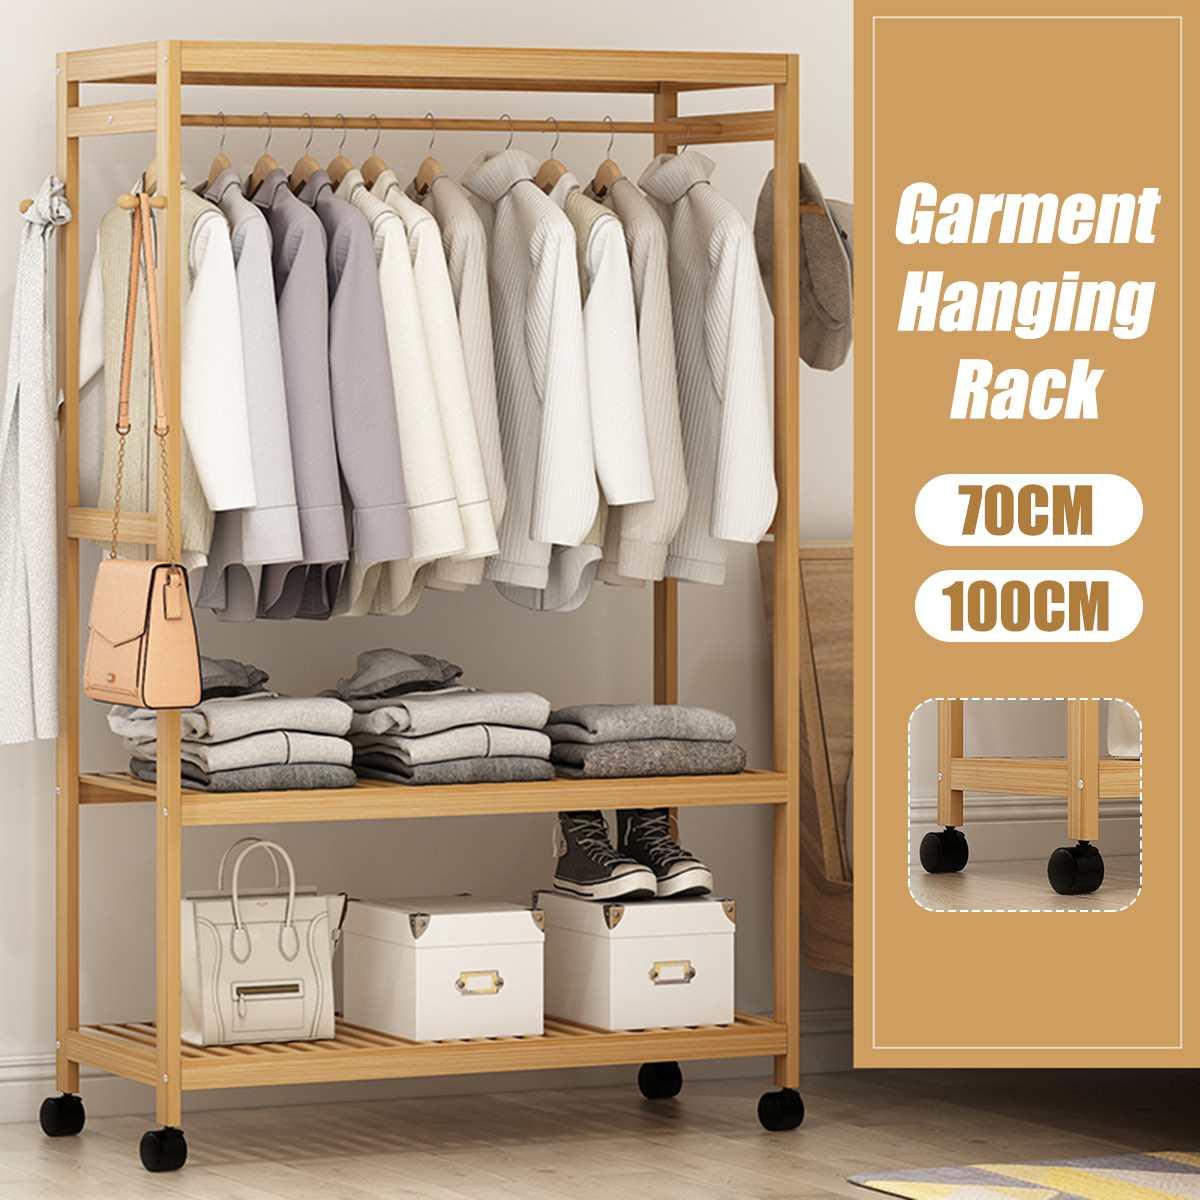 Bamboo Coat Rack Floor Standing Clothes Hanging Storage Shelf Clothes Hanger Racks Bedroom Furniture Garment font